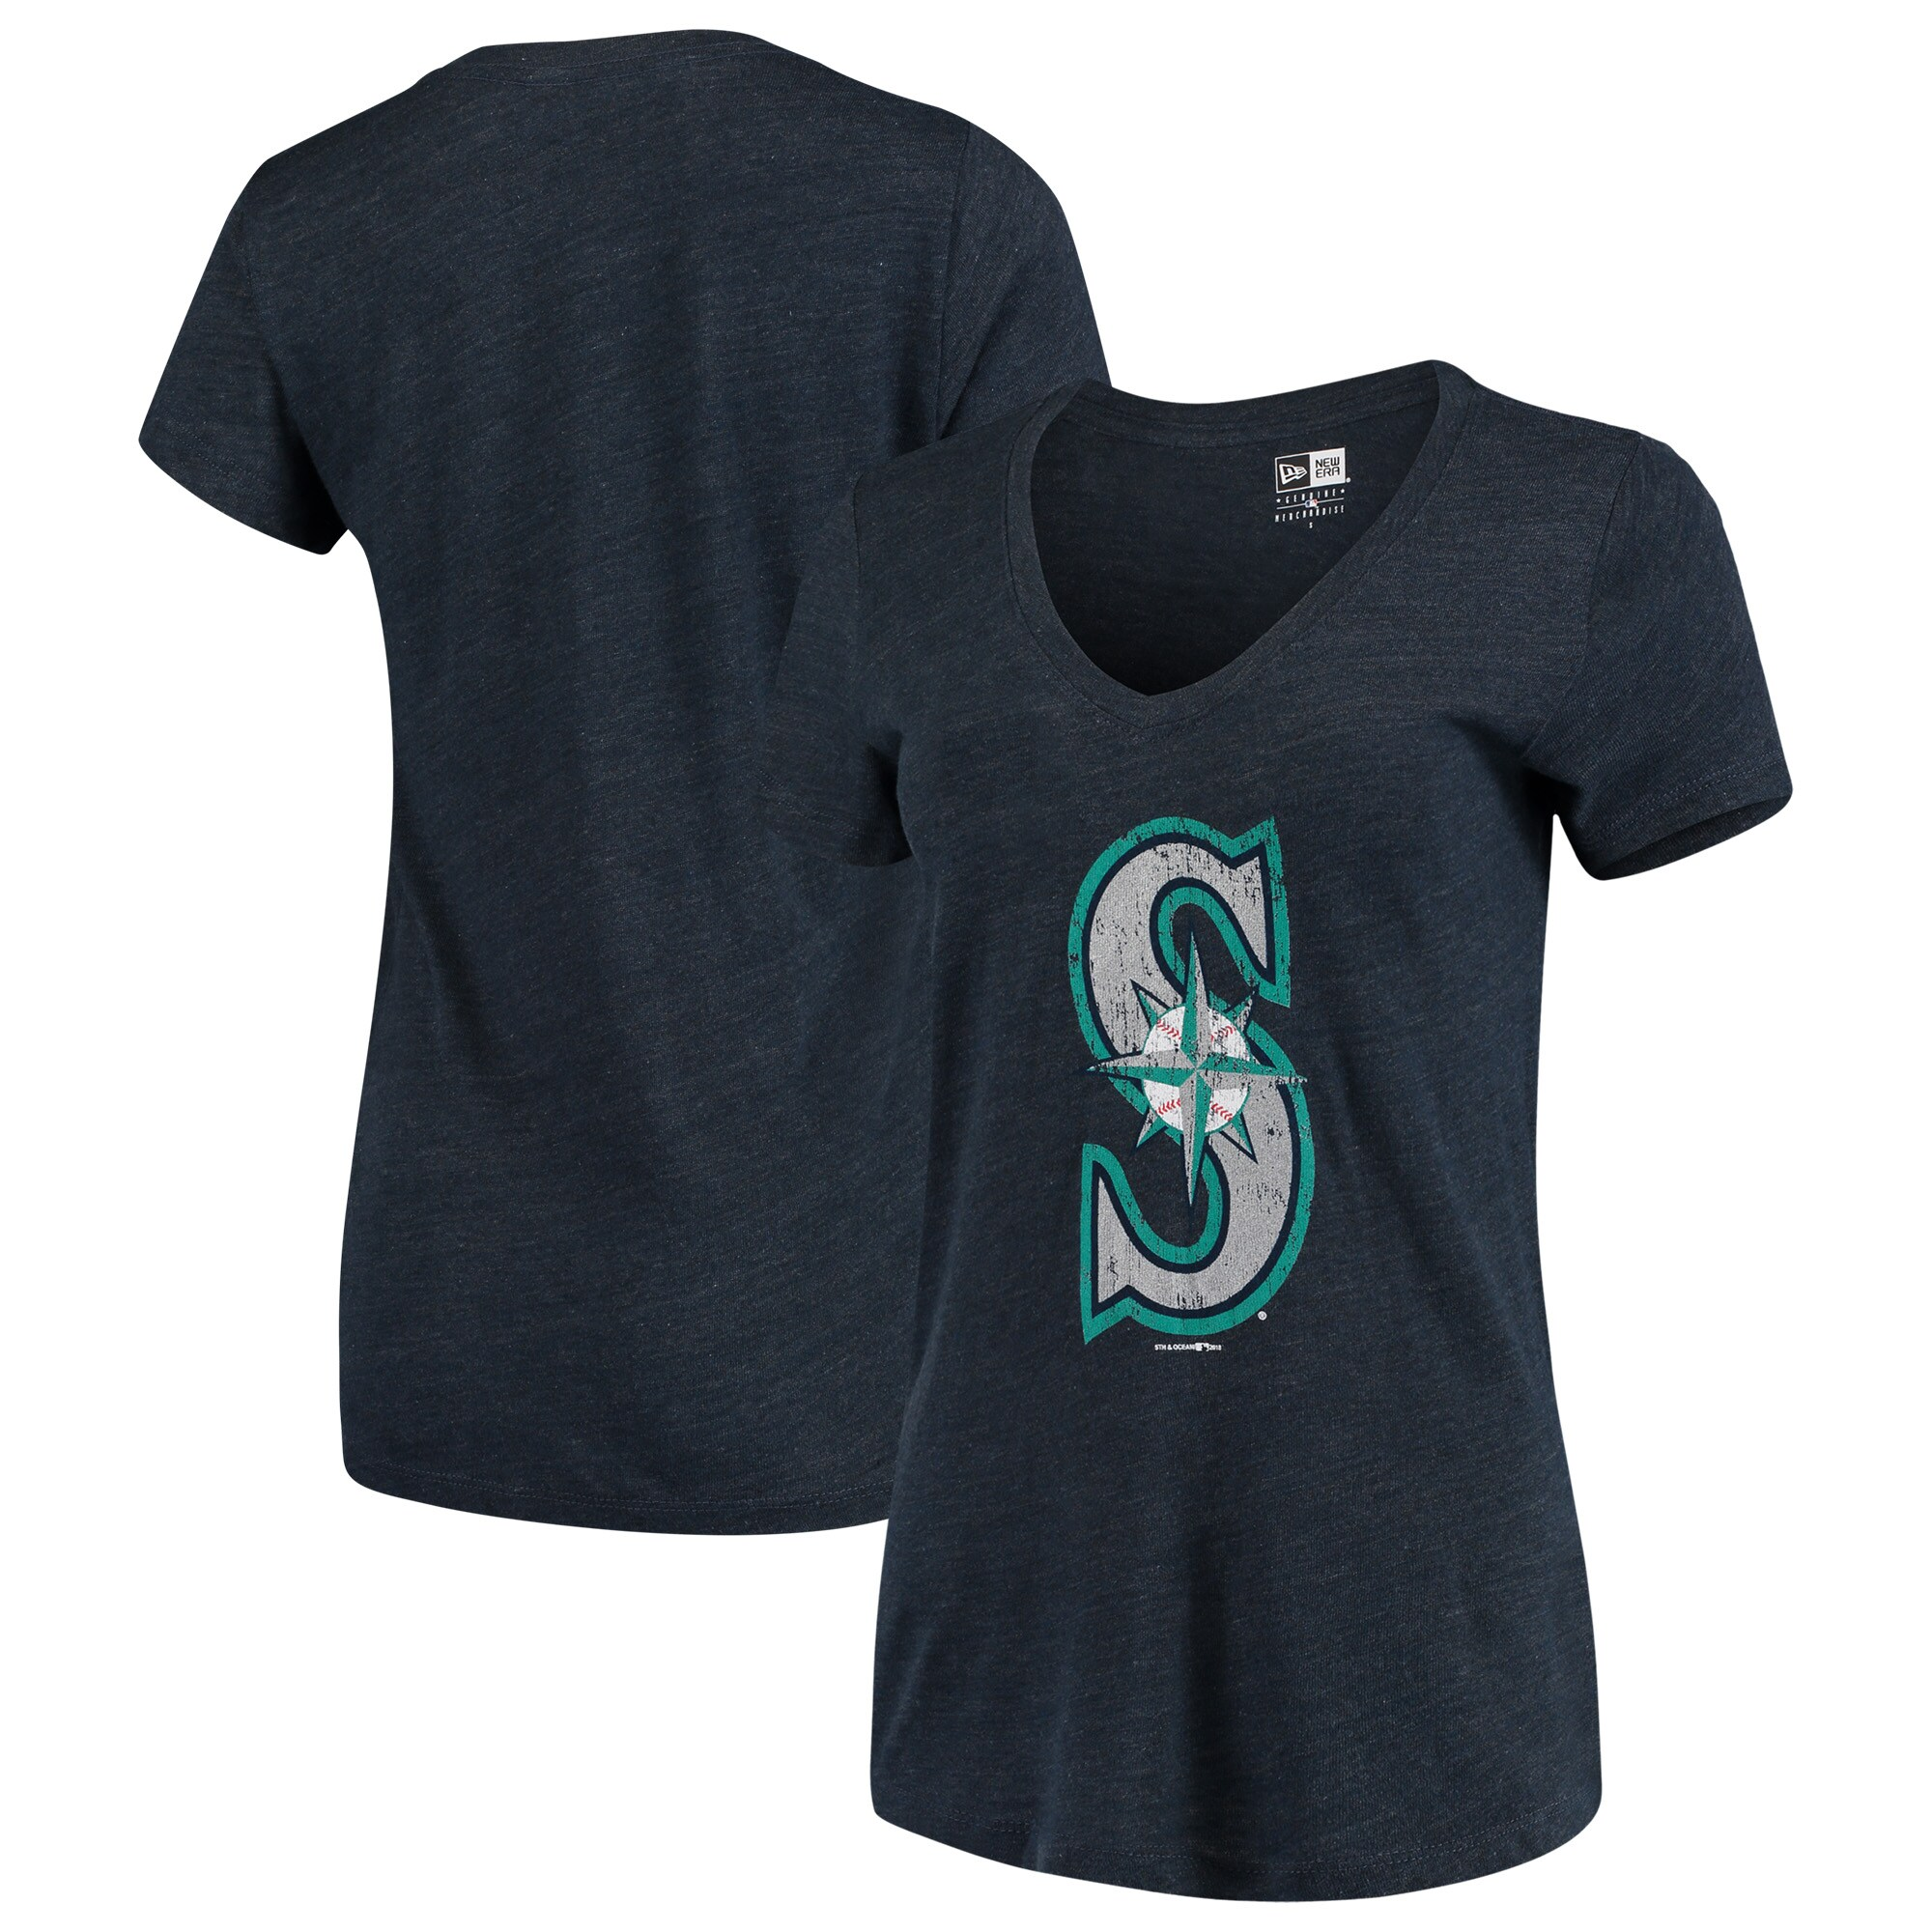 Seattle Mariners 5th & Ocean by New Era Women's Tri-Blend Basic Logo V-Neck T-Shirt - Navy